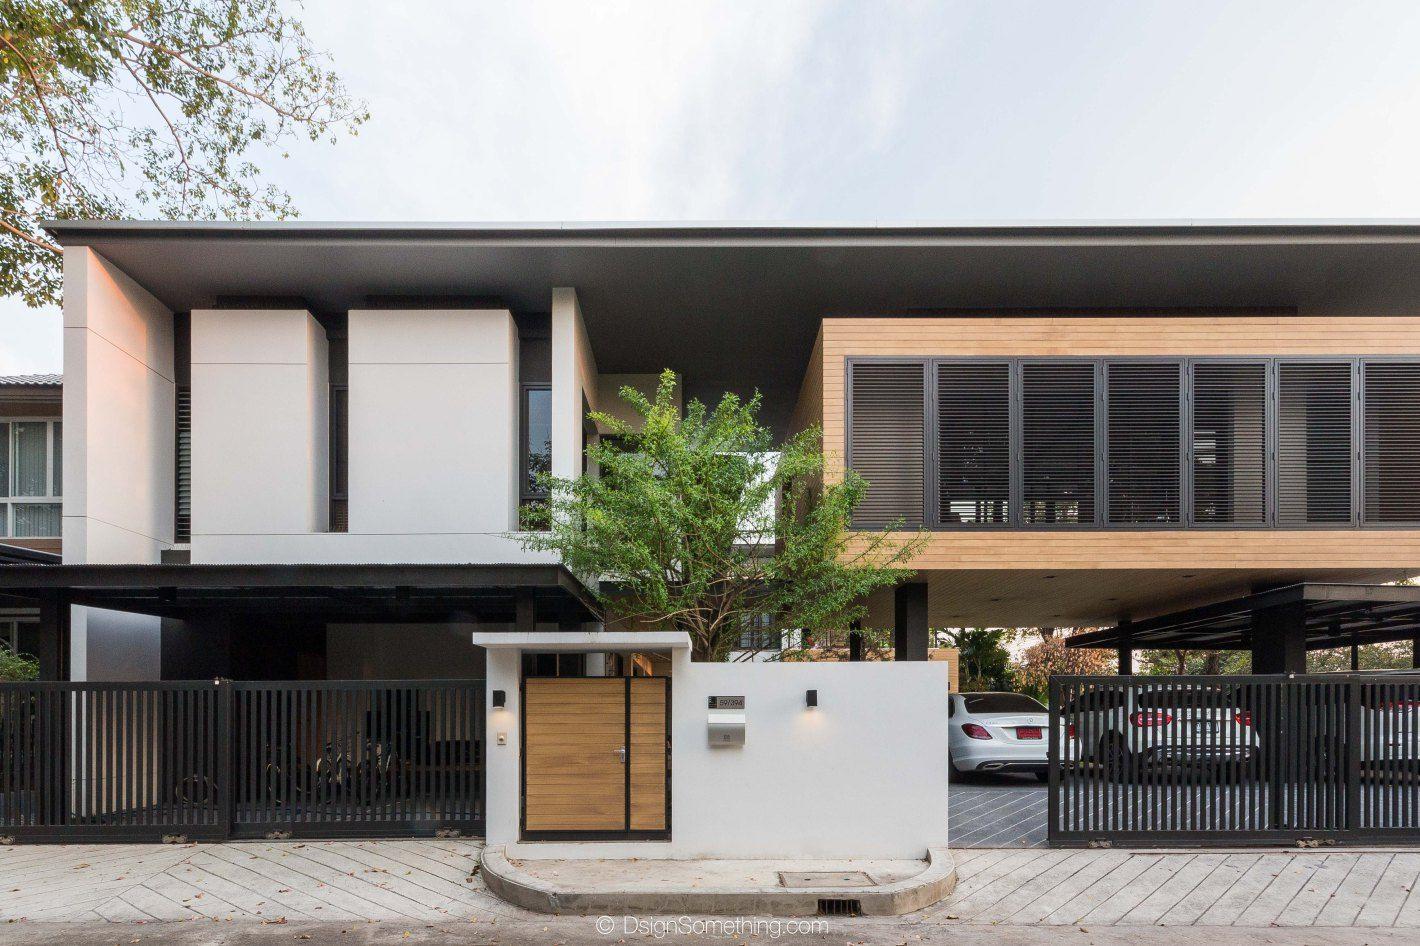 K Oum K Pol House L Greendwell Tropical Modern House Bangkok สถาป ตยกรรมสม ยใหม สถาป ตยกรรมบ าน บ านโมเด ร น